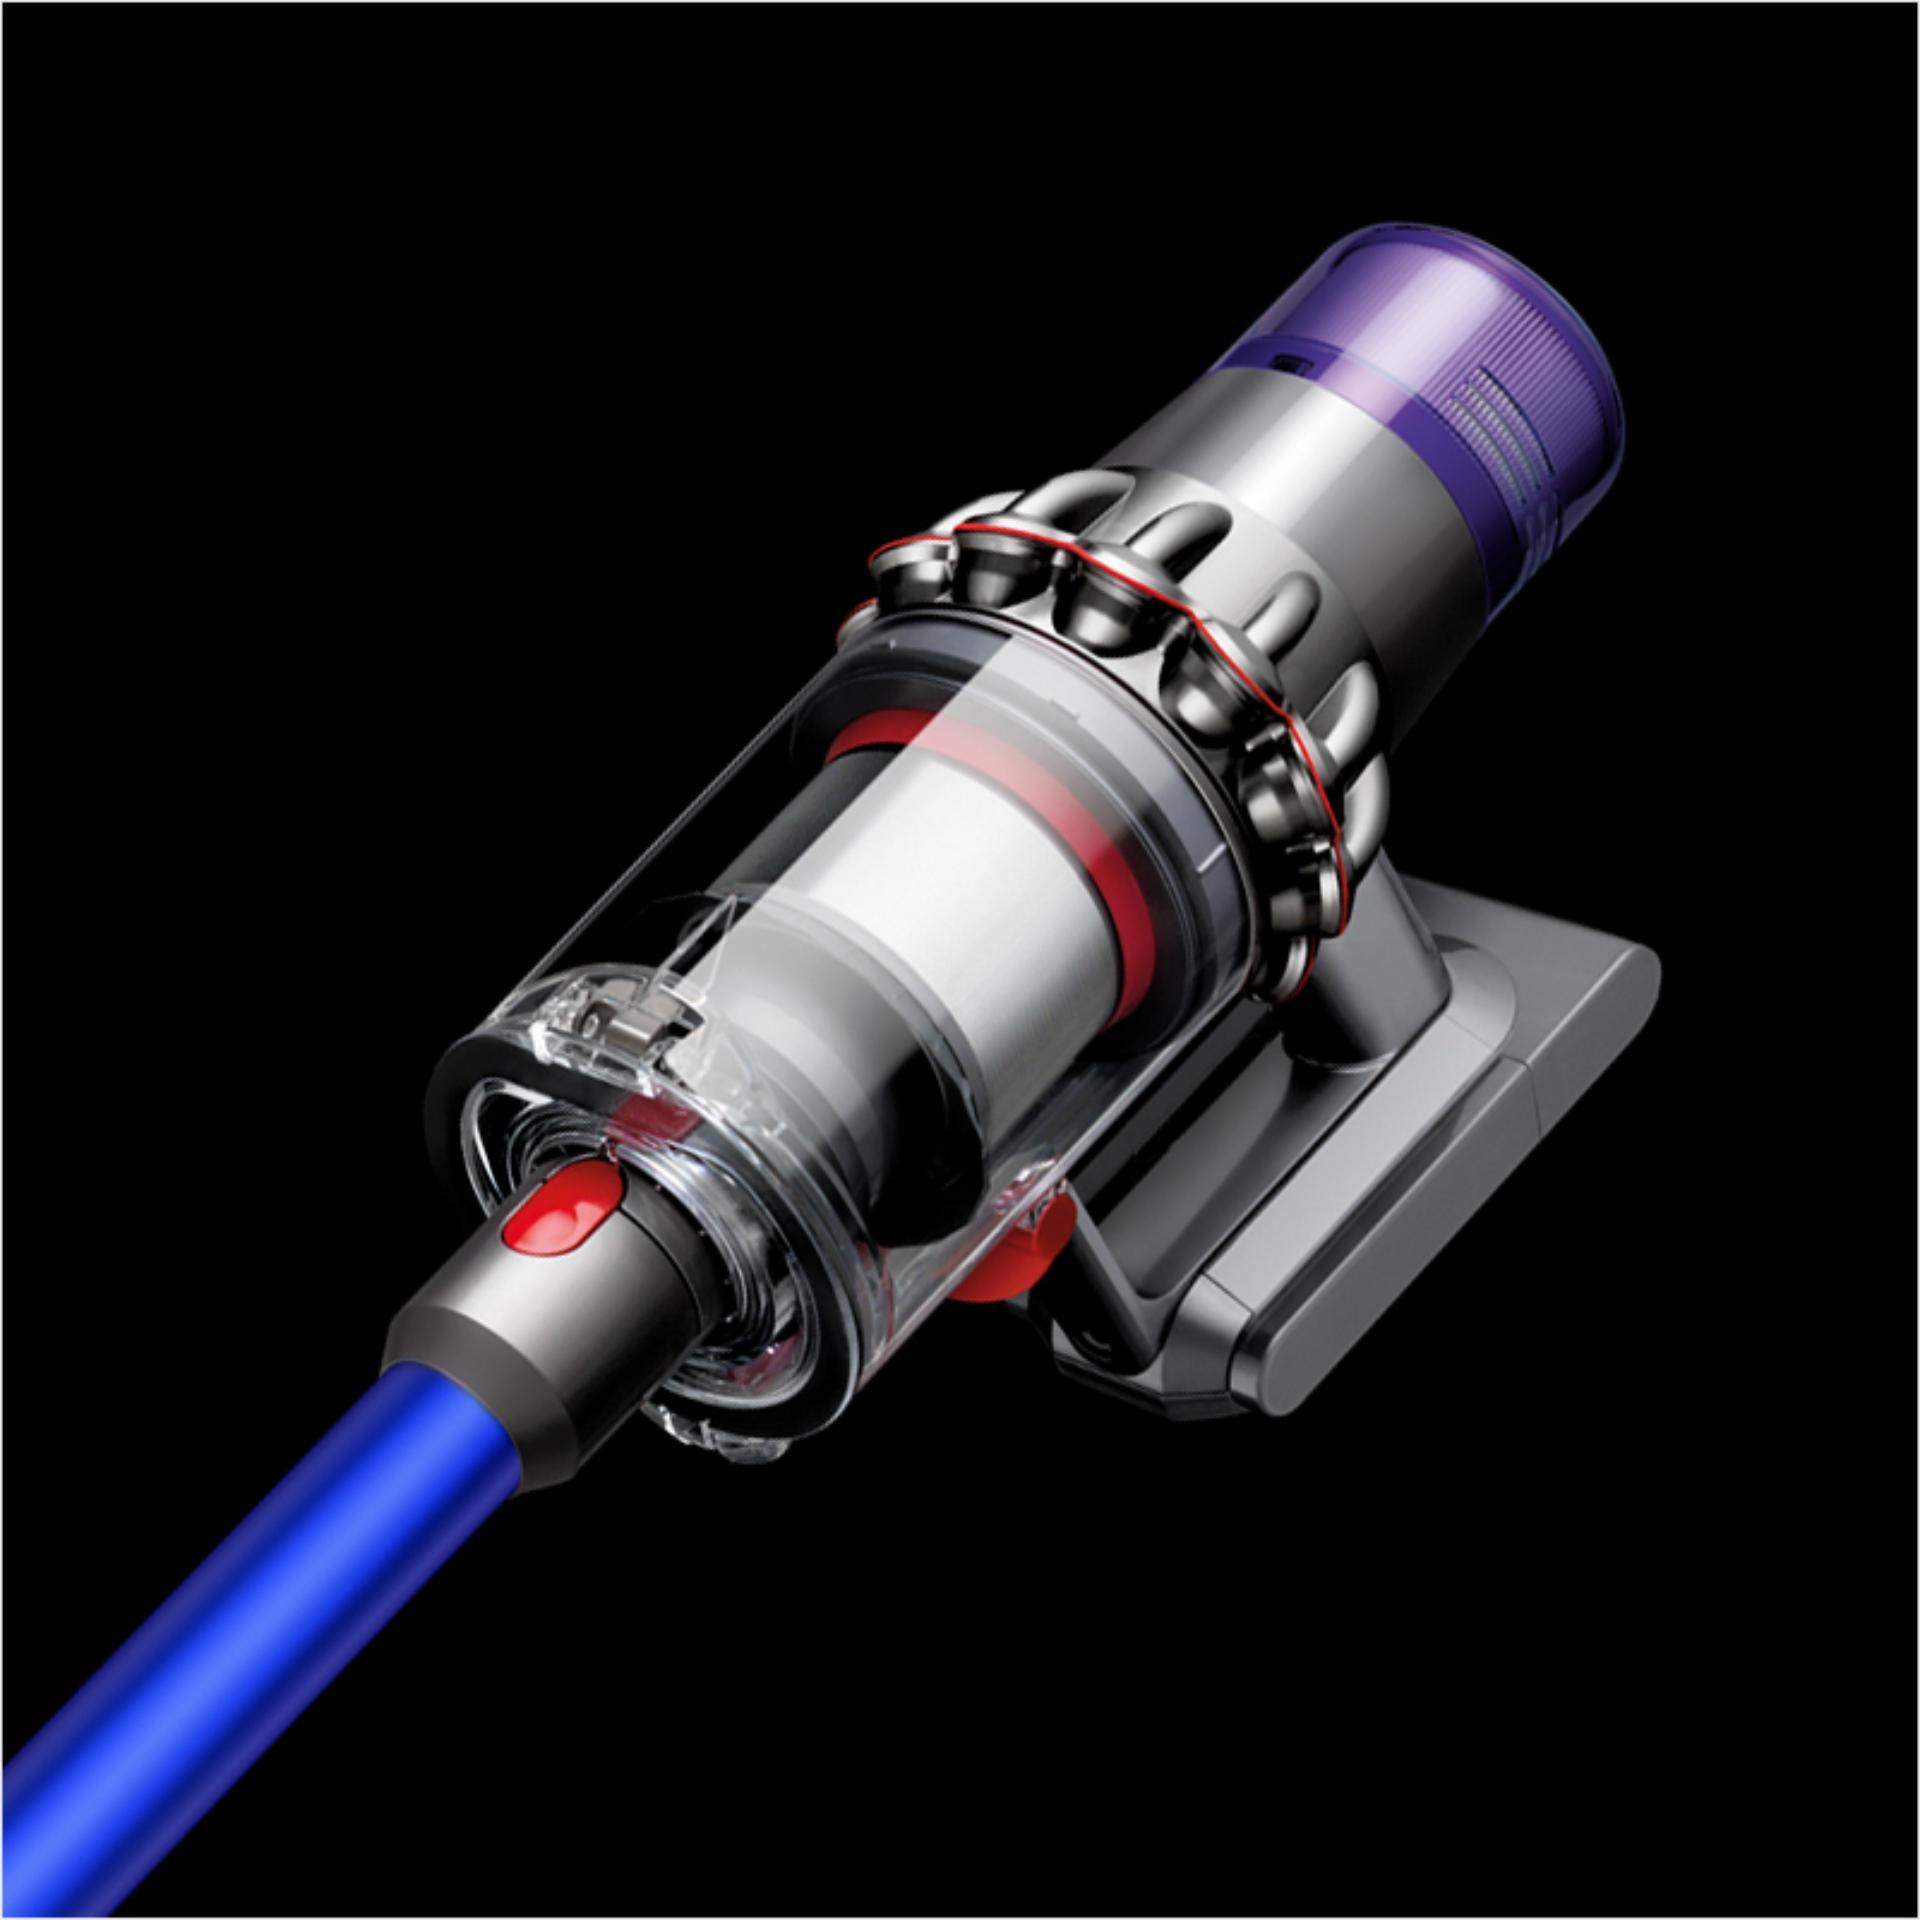 Dyson V11™ vacuum cleaner